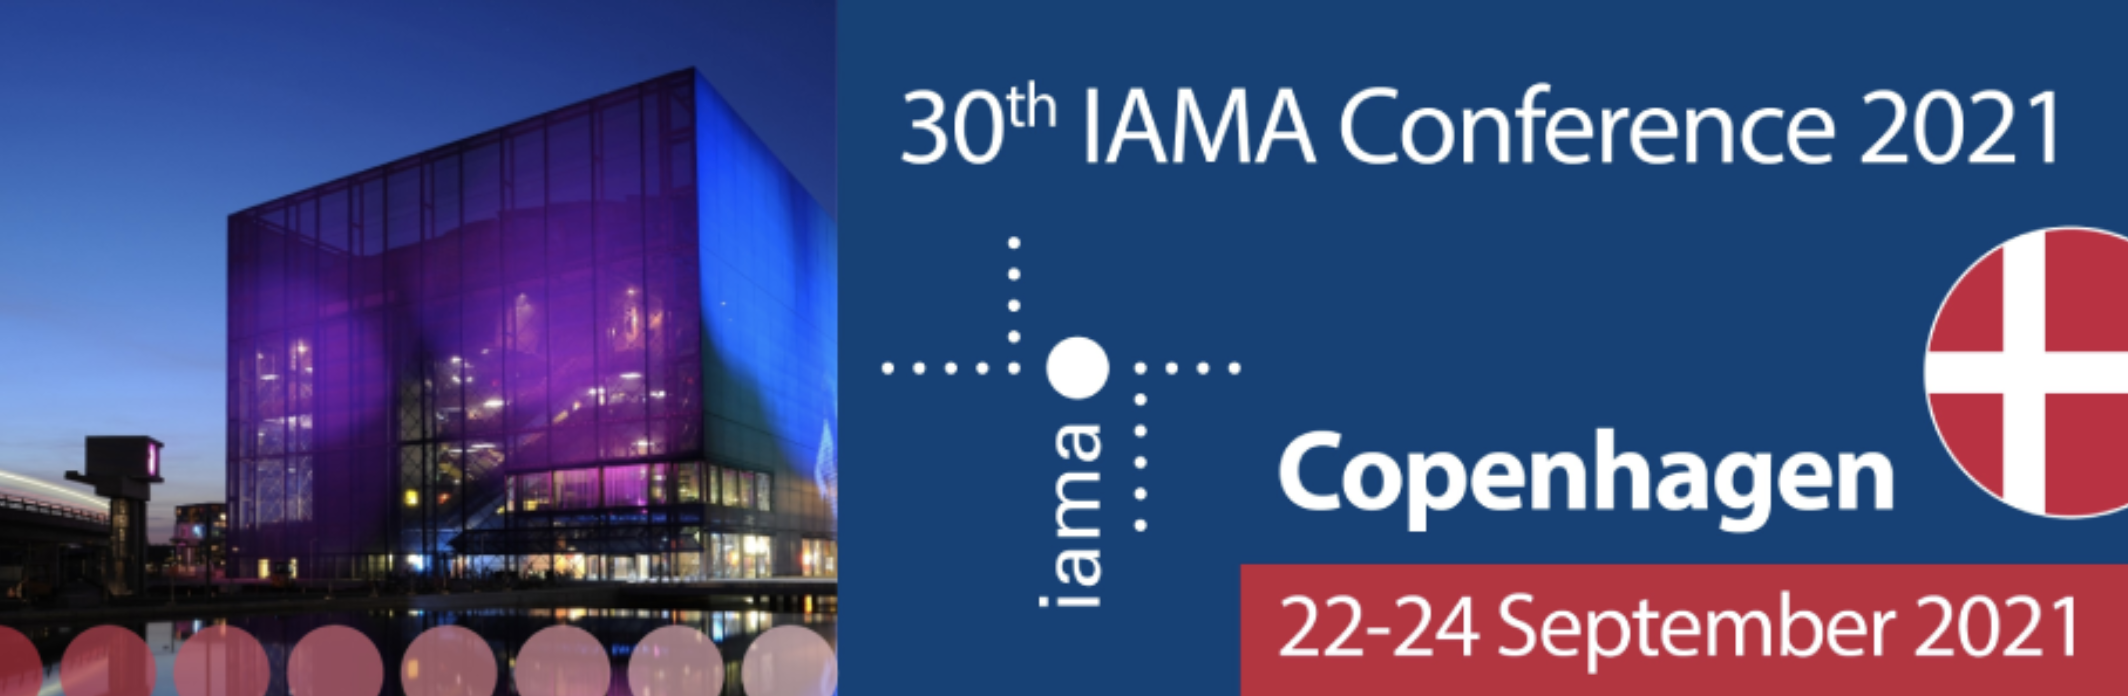 IAMA Conference Copenhagen 2021